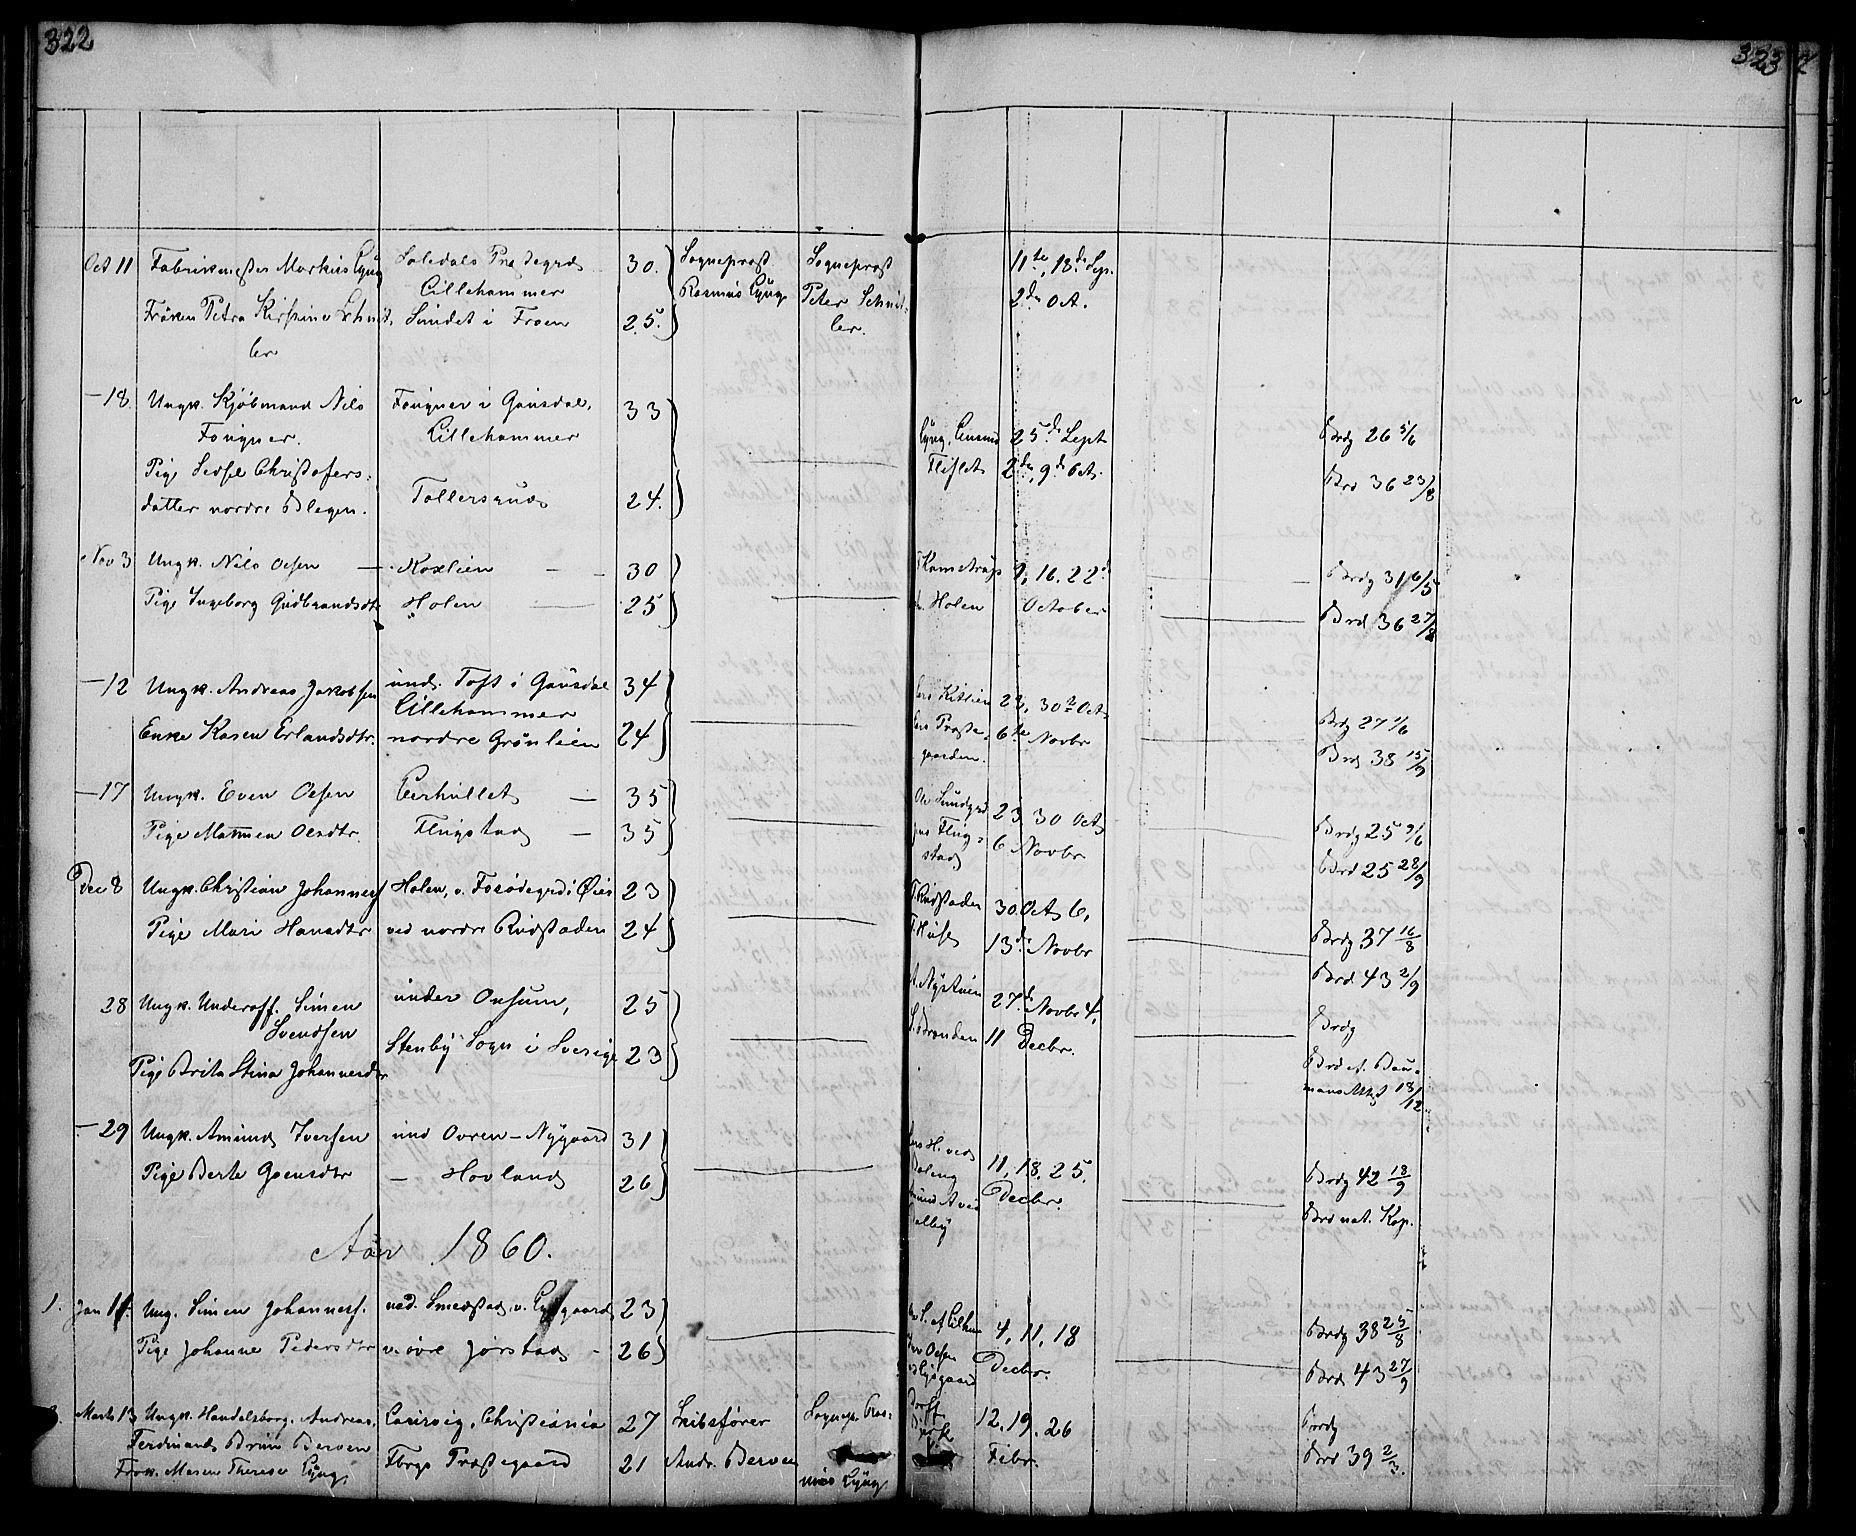 SAH, Fåberg prestekontor, Klokkerbok nr. 5, 1837-1864, s. 322-323